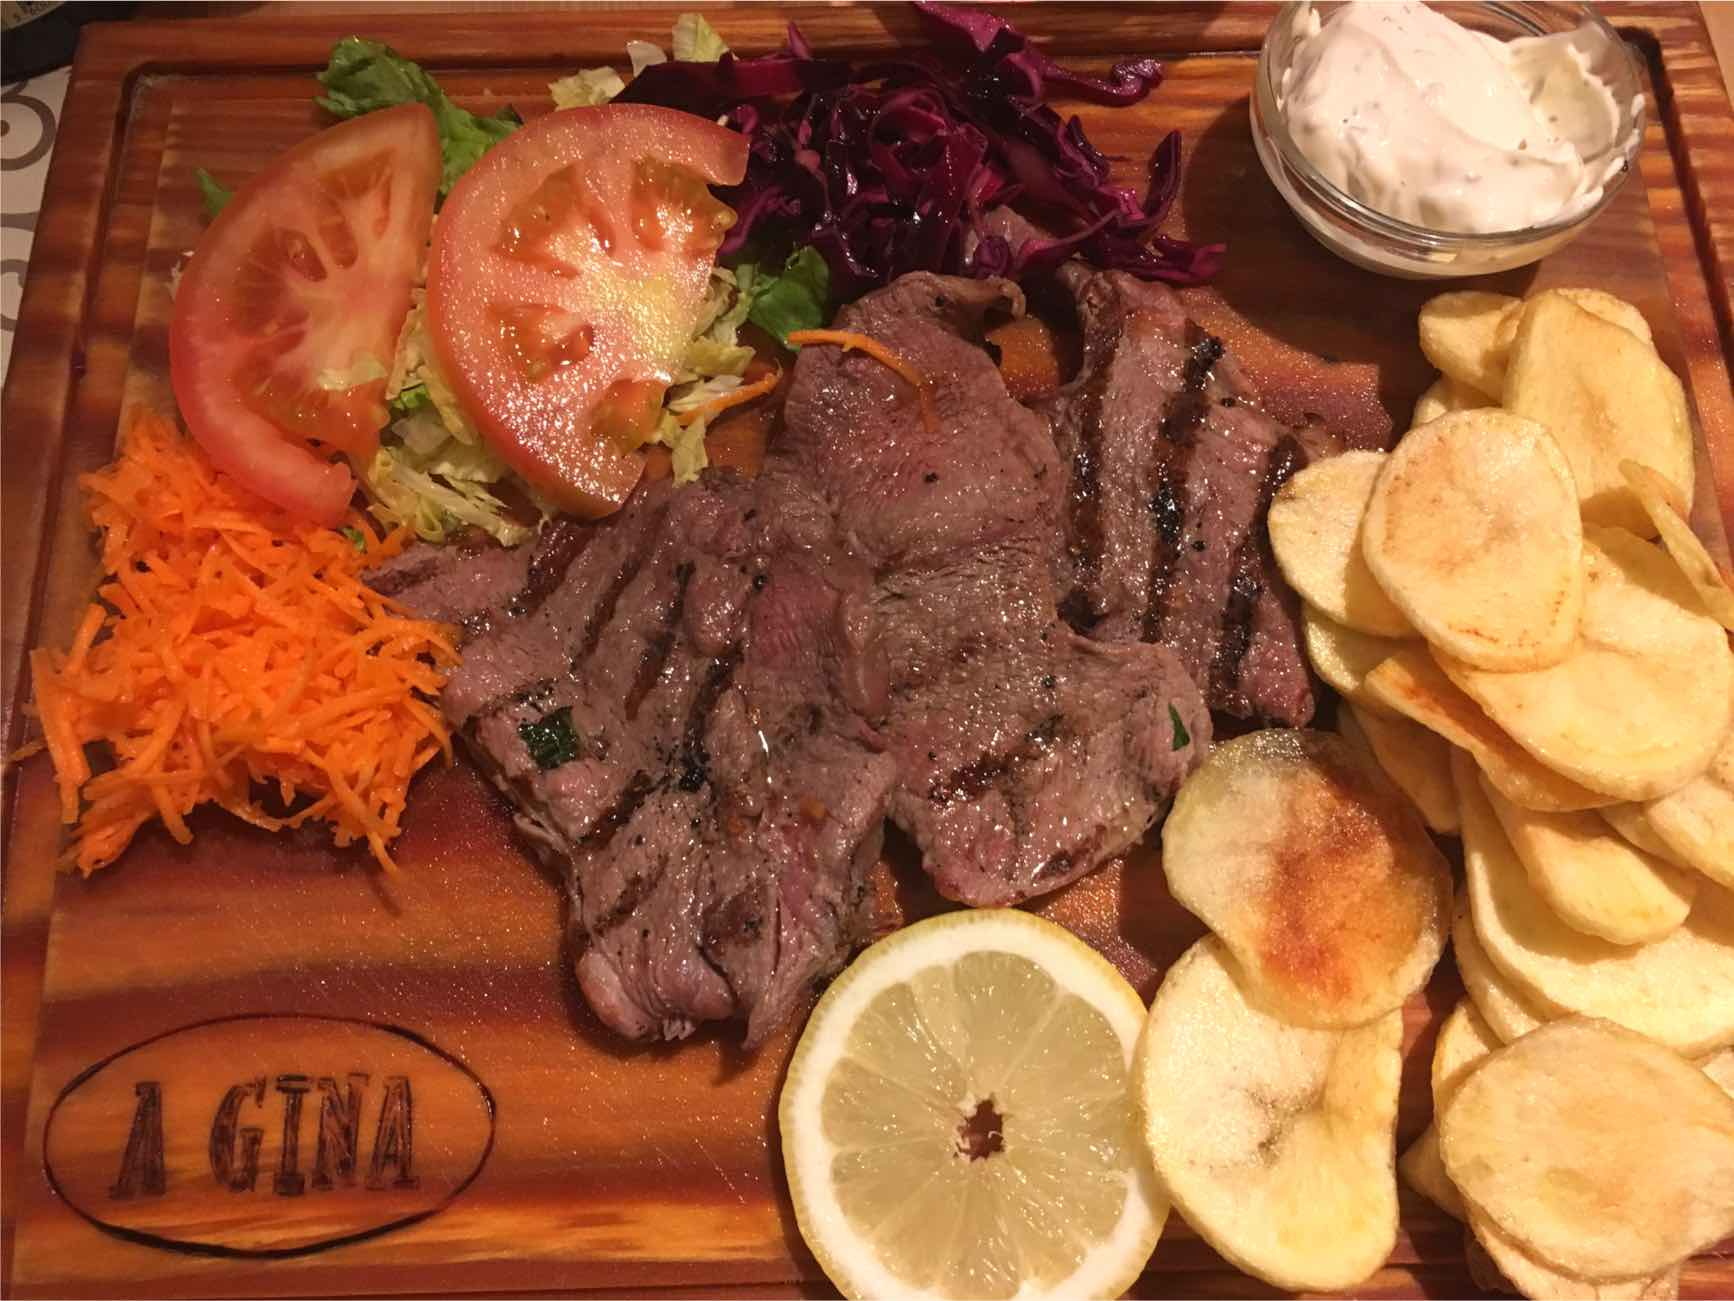 city guide lisbon travel blog meat platter food lisboa